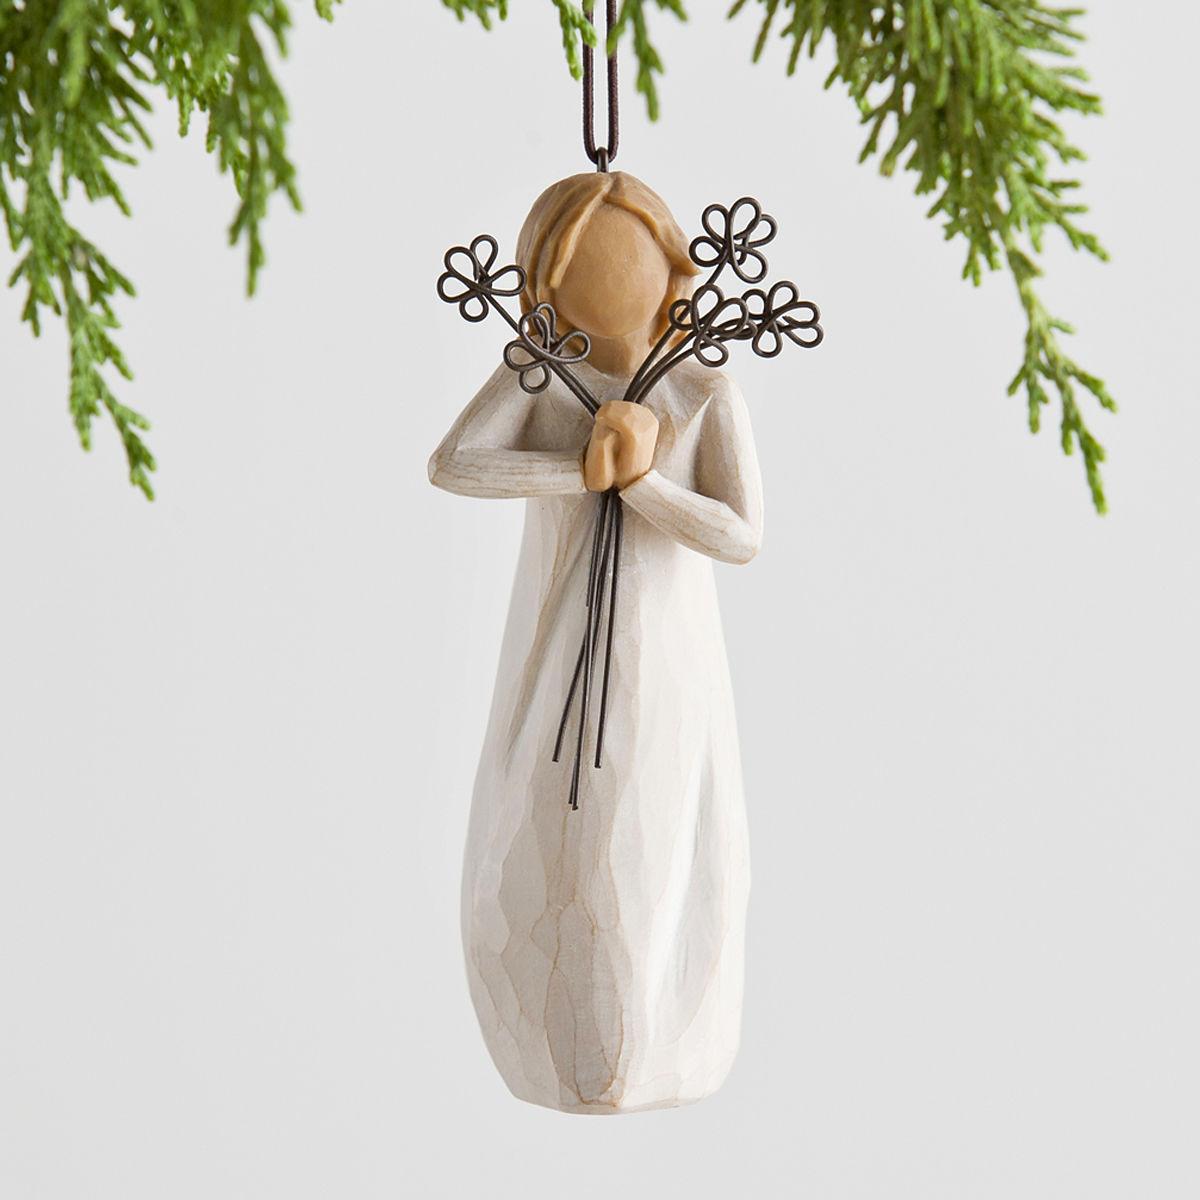 Willow tree friendship ornament